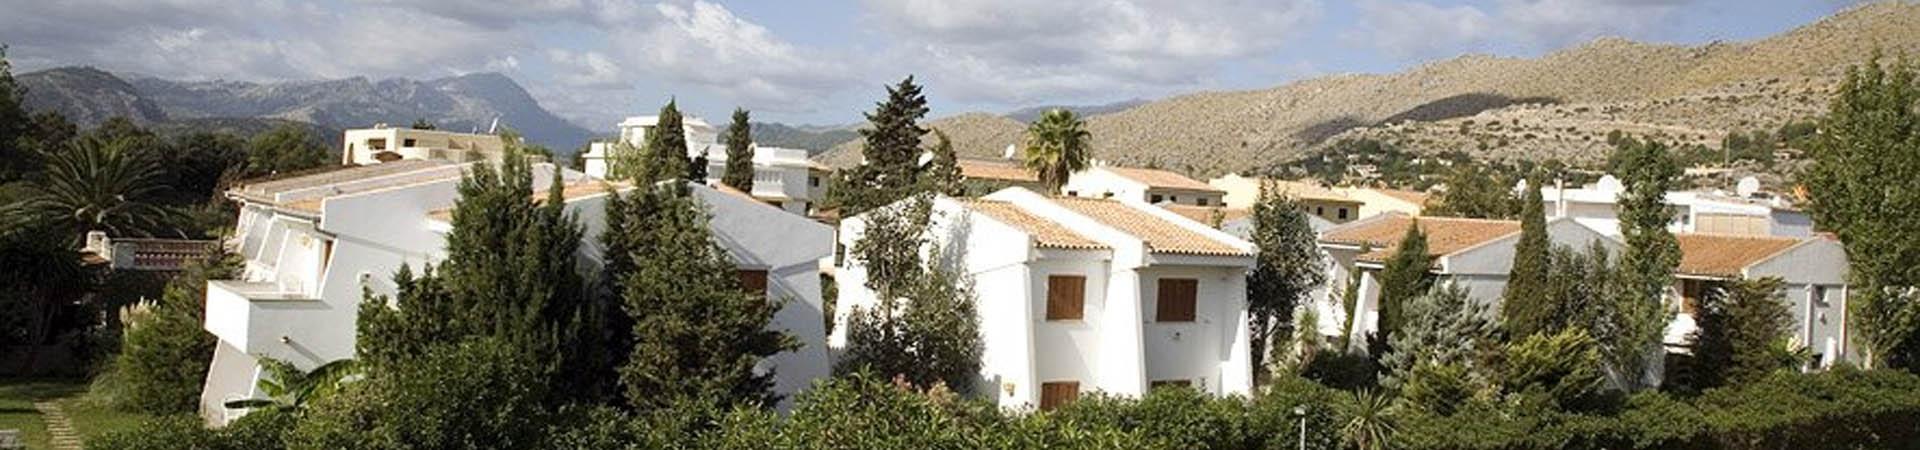 Apartamentos LEO Tourism Services Puerto de Pollensa Balears, Illes